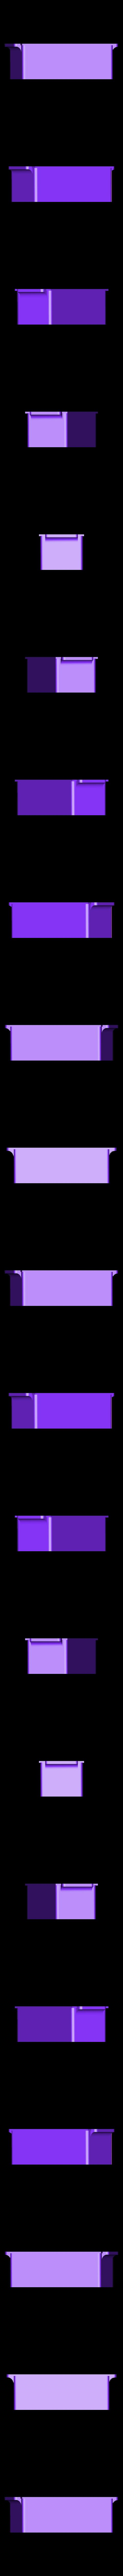 Batterie PL_dessous.STL Download STL file Battery for rc trucks • 3D print object, ConceptRCTruck